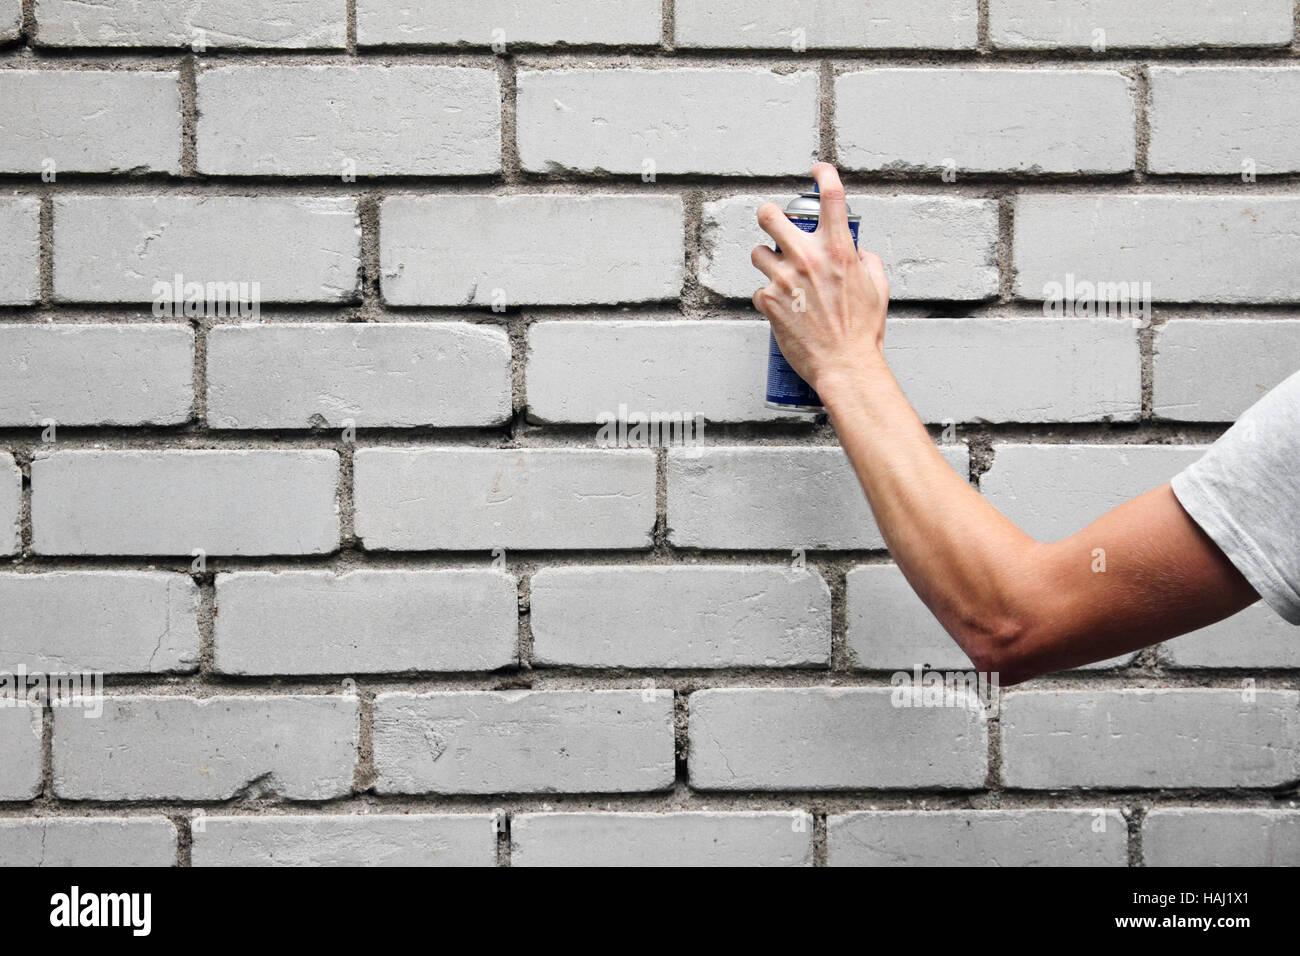 Main Tenant Une Bombe De Peinture Graffiti En Face D Un Mur